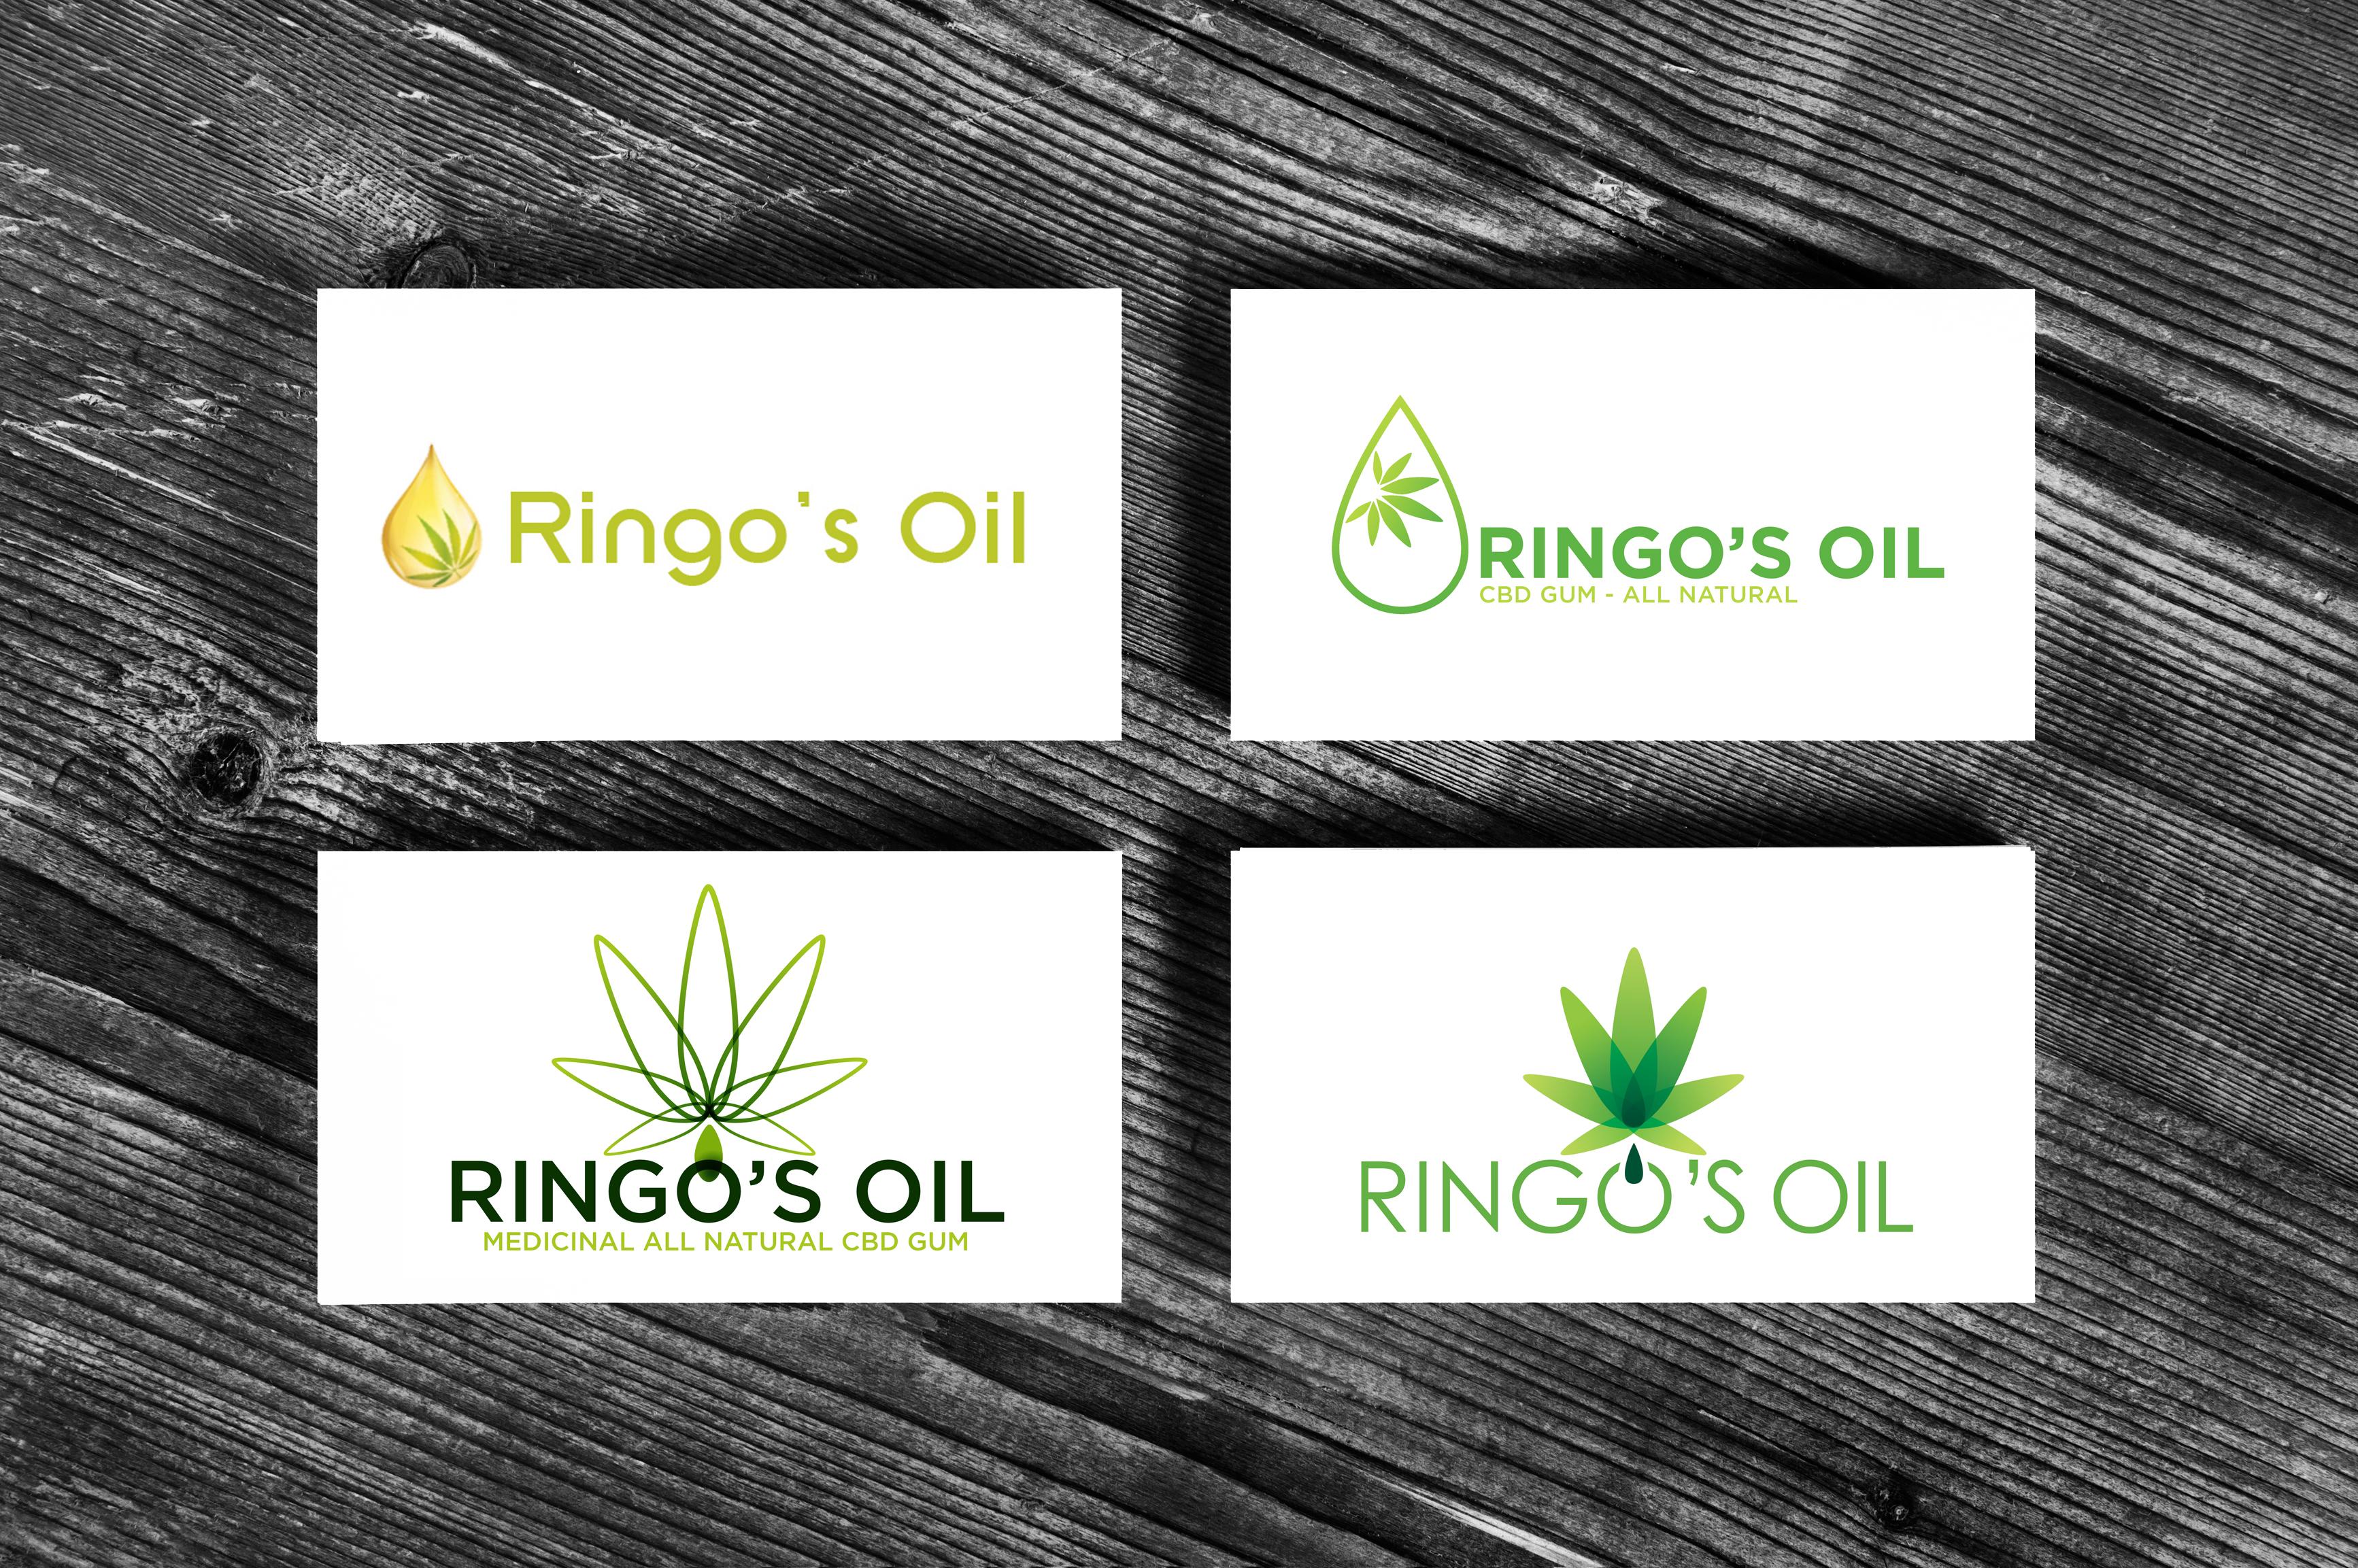 Ringo's oil logos